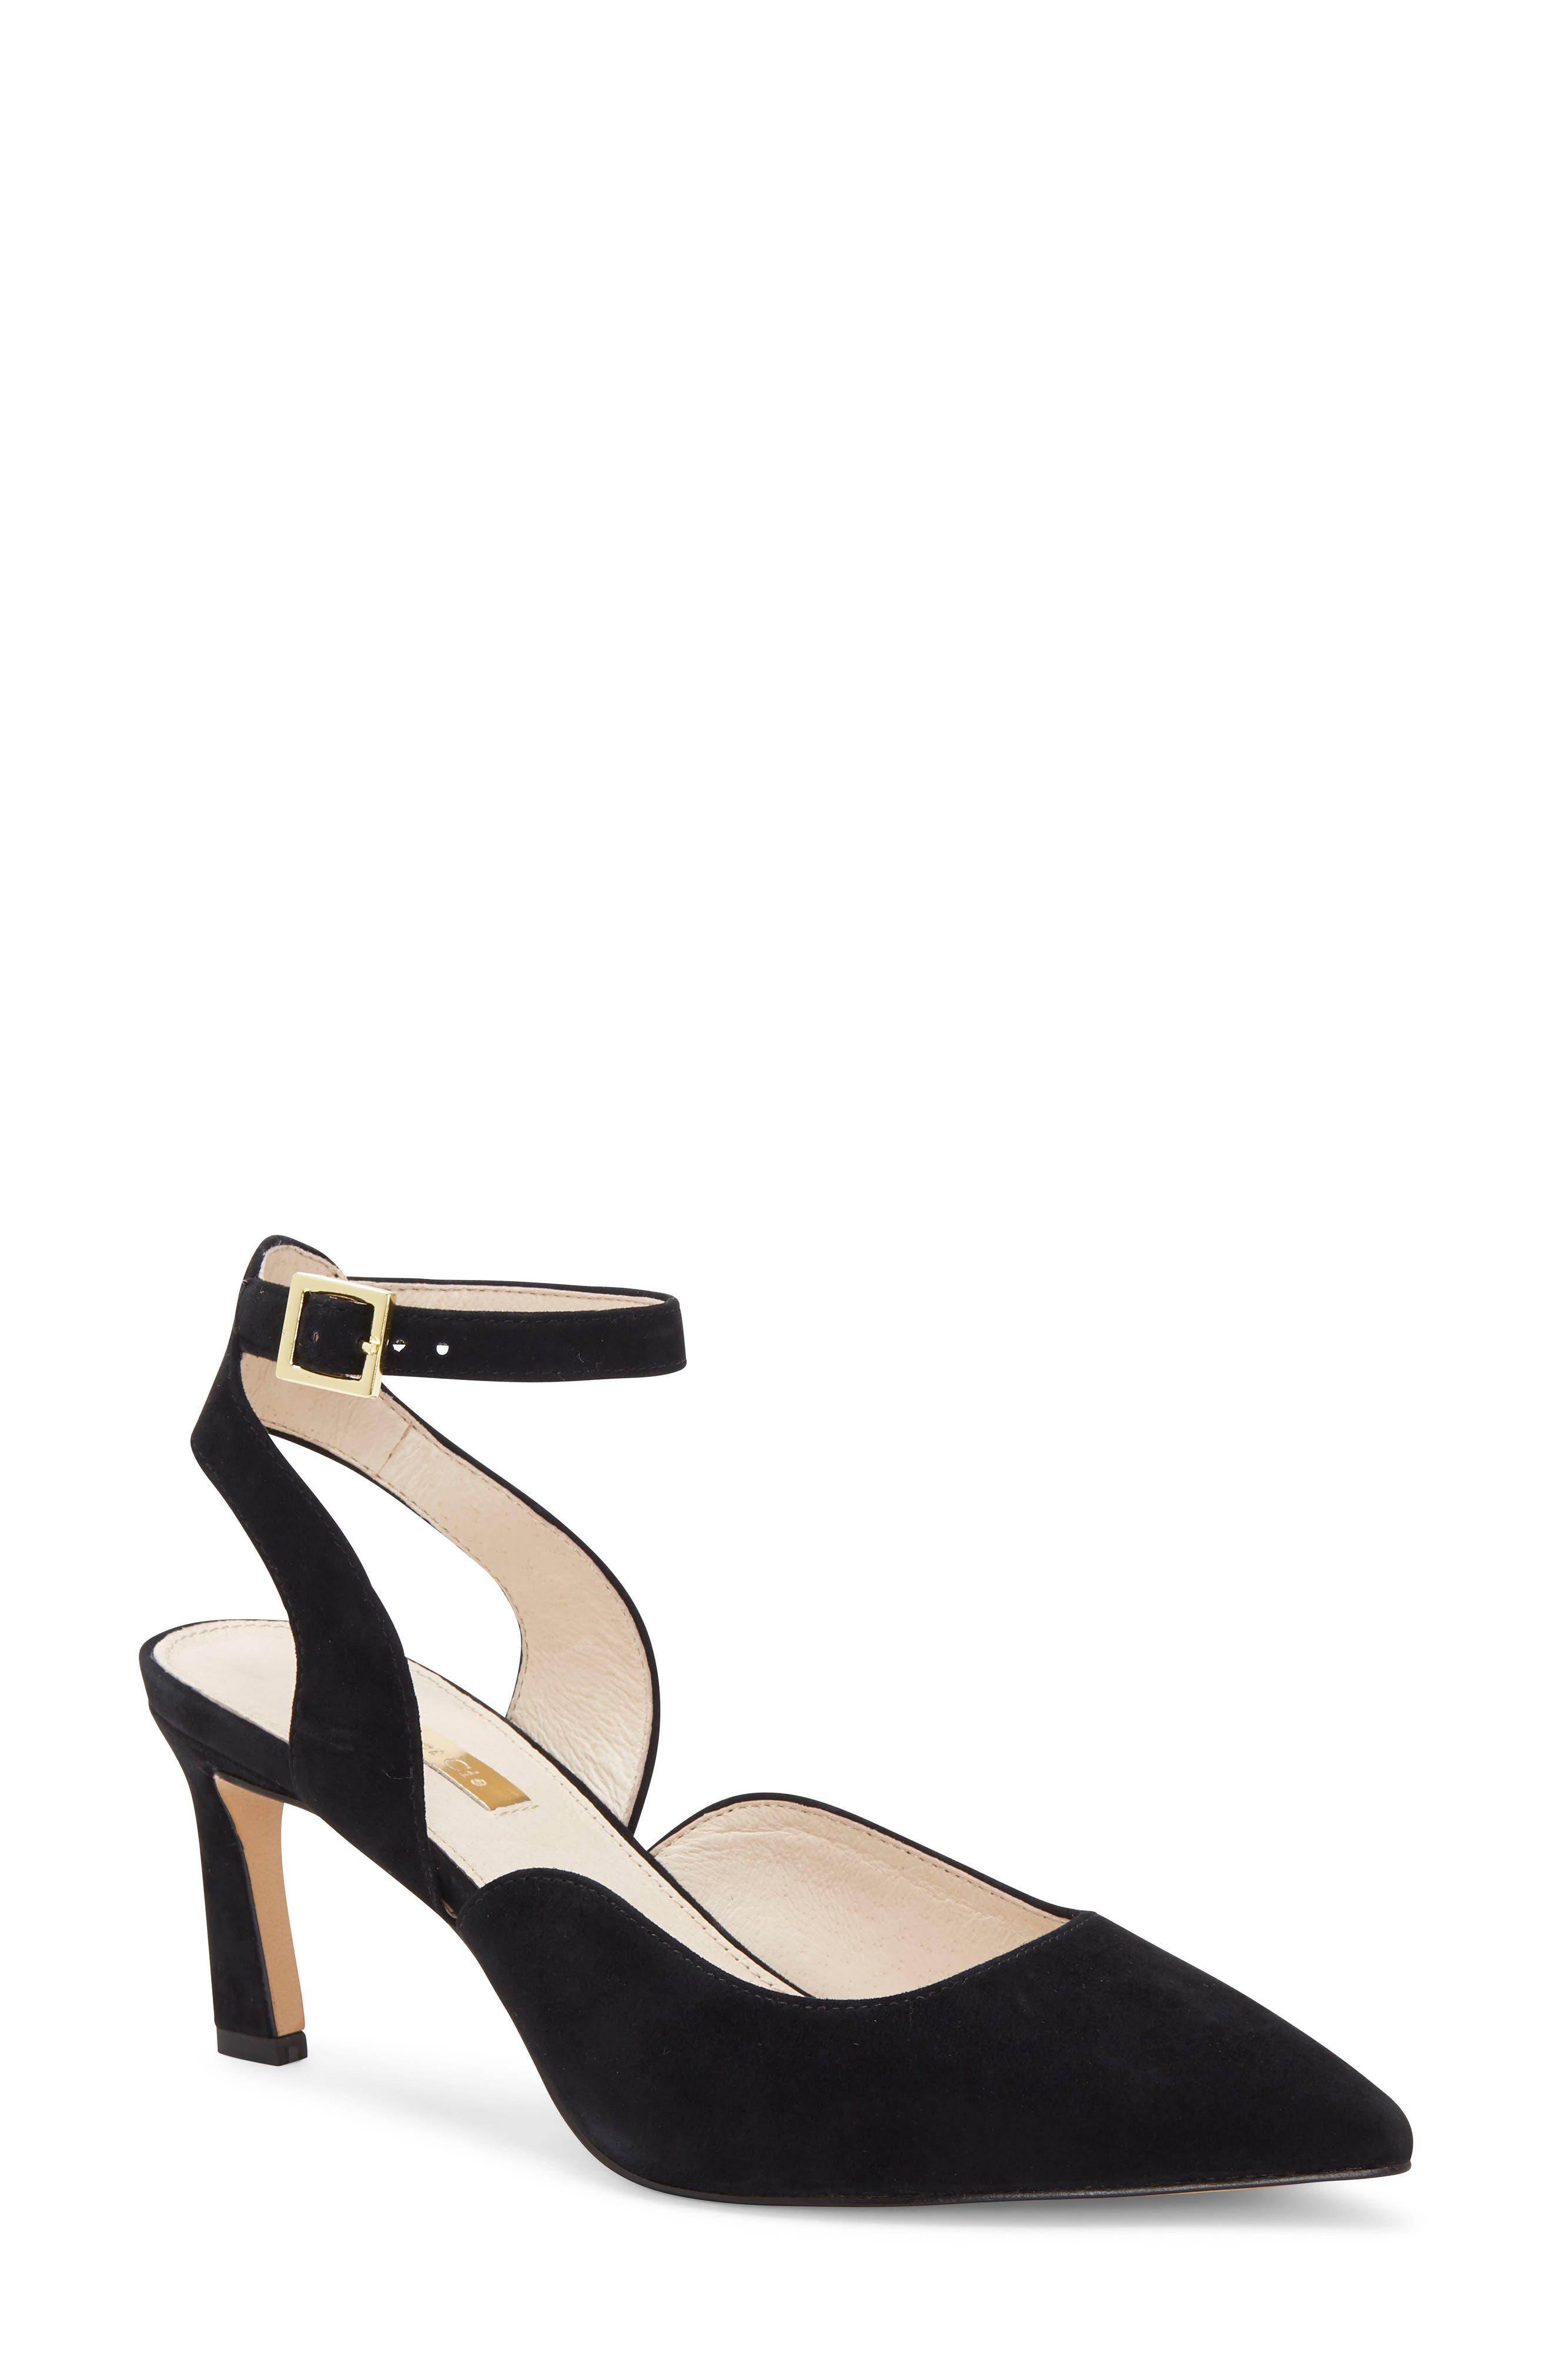 Louise Et Cie Kayin Ankle Strap Pump- Black